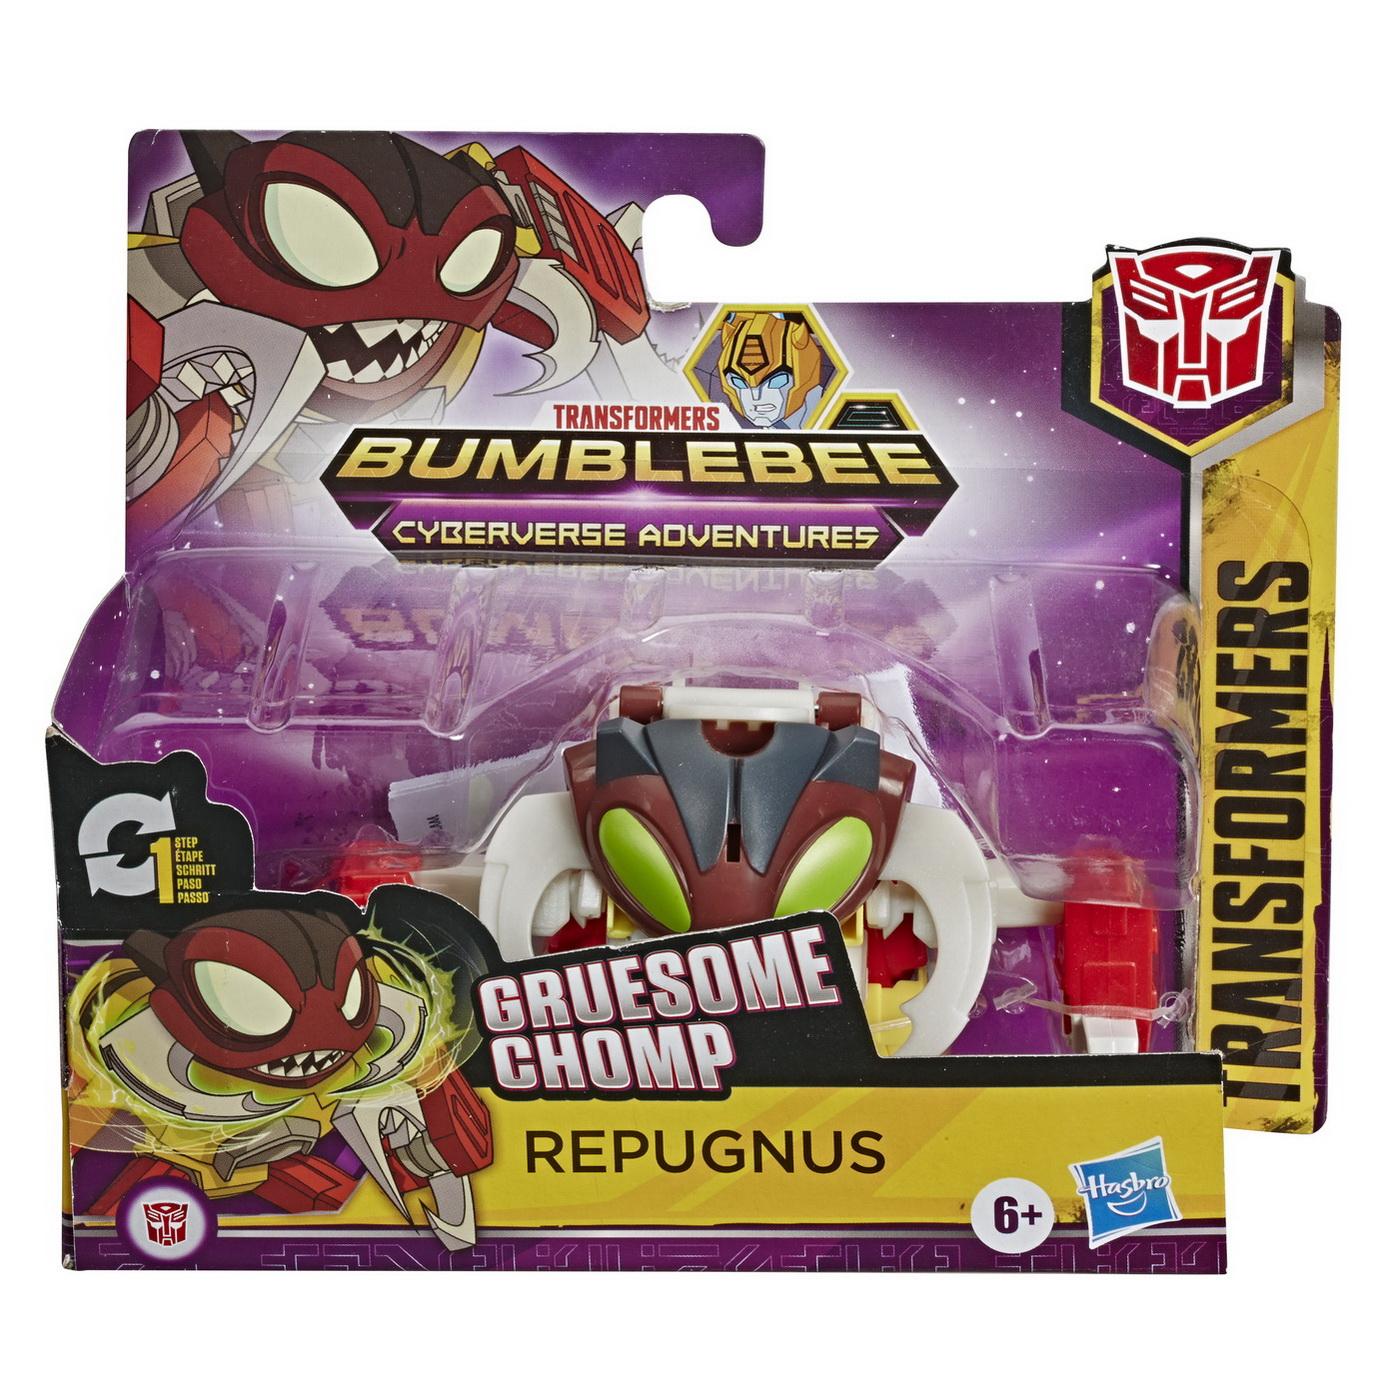 Transformers Robot Vehicul Cyberverse 1 Step Decepticon Repugnus